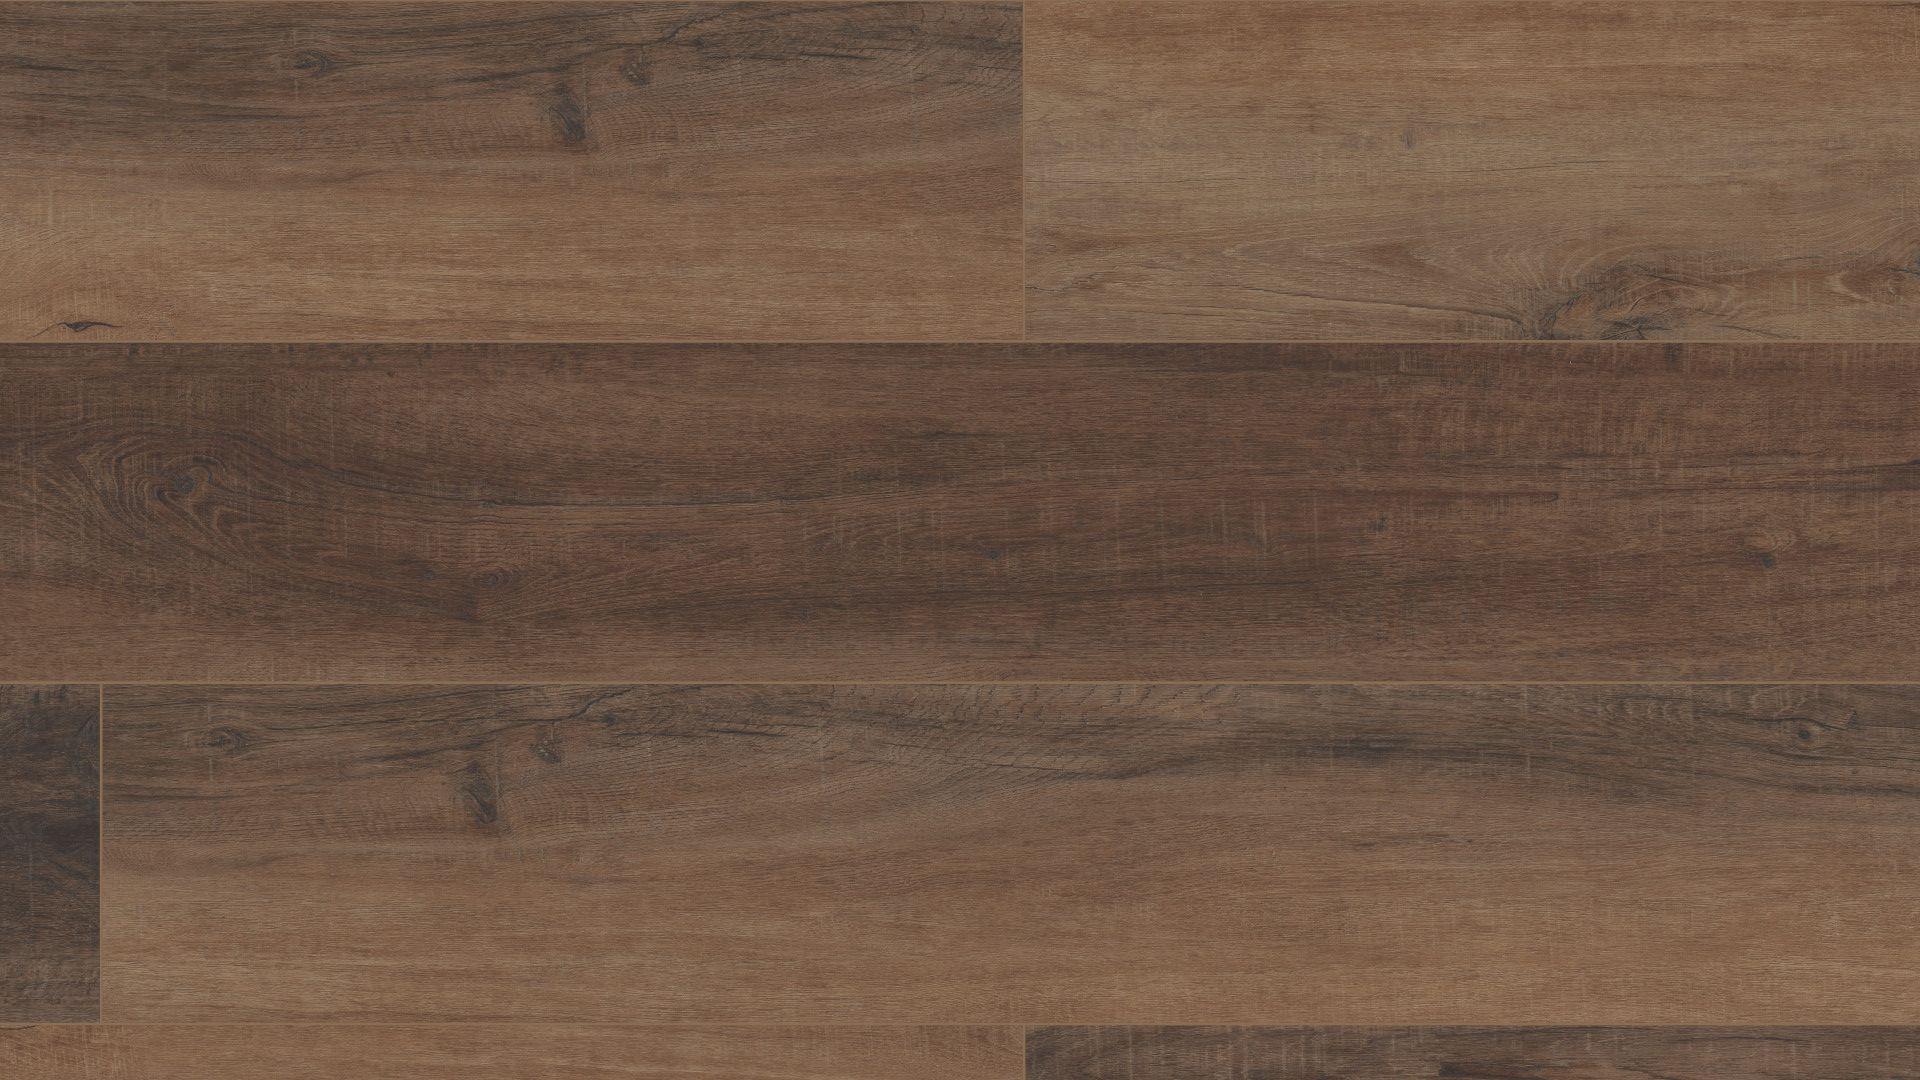 Cheshire Elm Vv488 02094 Evp Vinyl Wood Flooring Coretec In 2020 Vinyl Wood Flooring Wood Vinyl Coretec